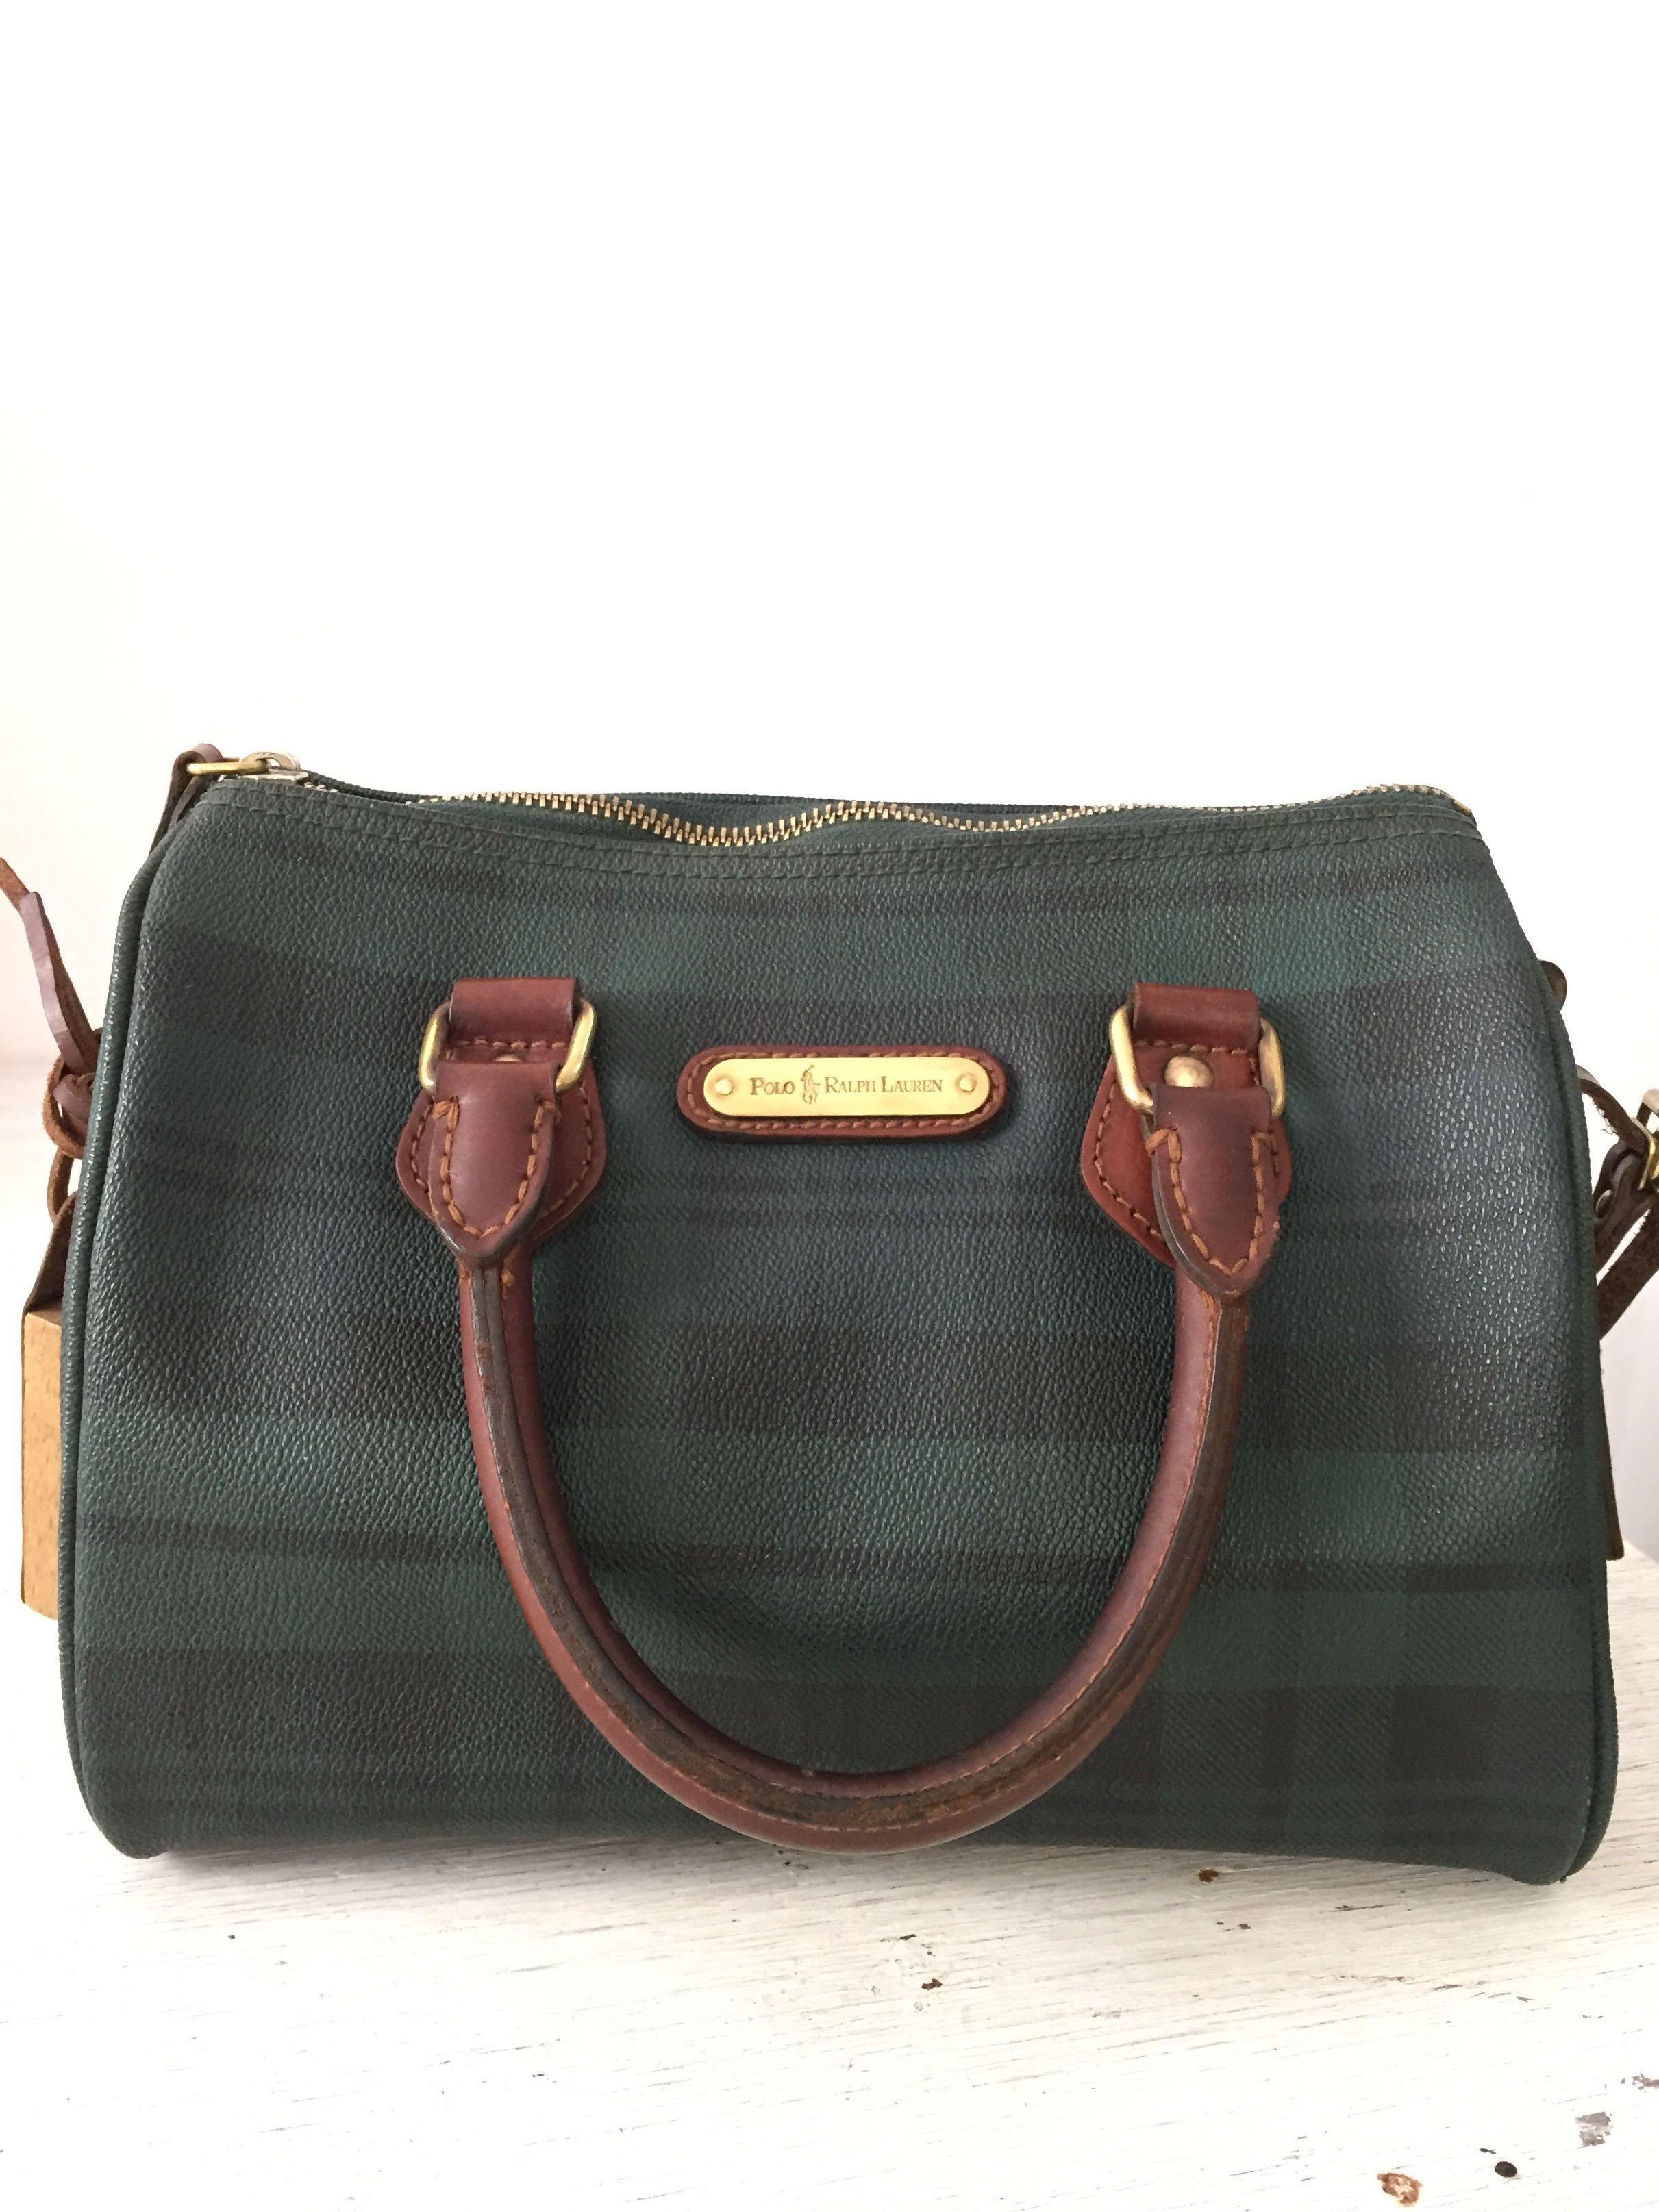 b42b7c2cac20 Vintage Polo Ralph Lauren bag